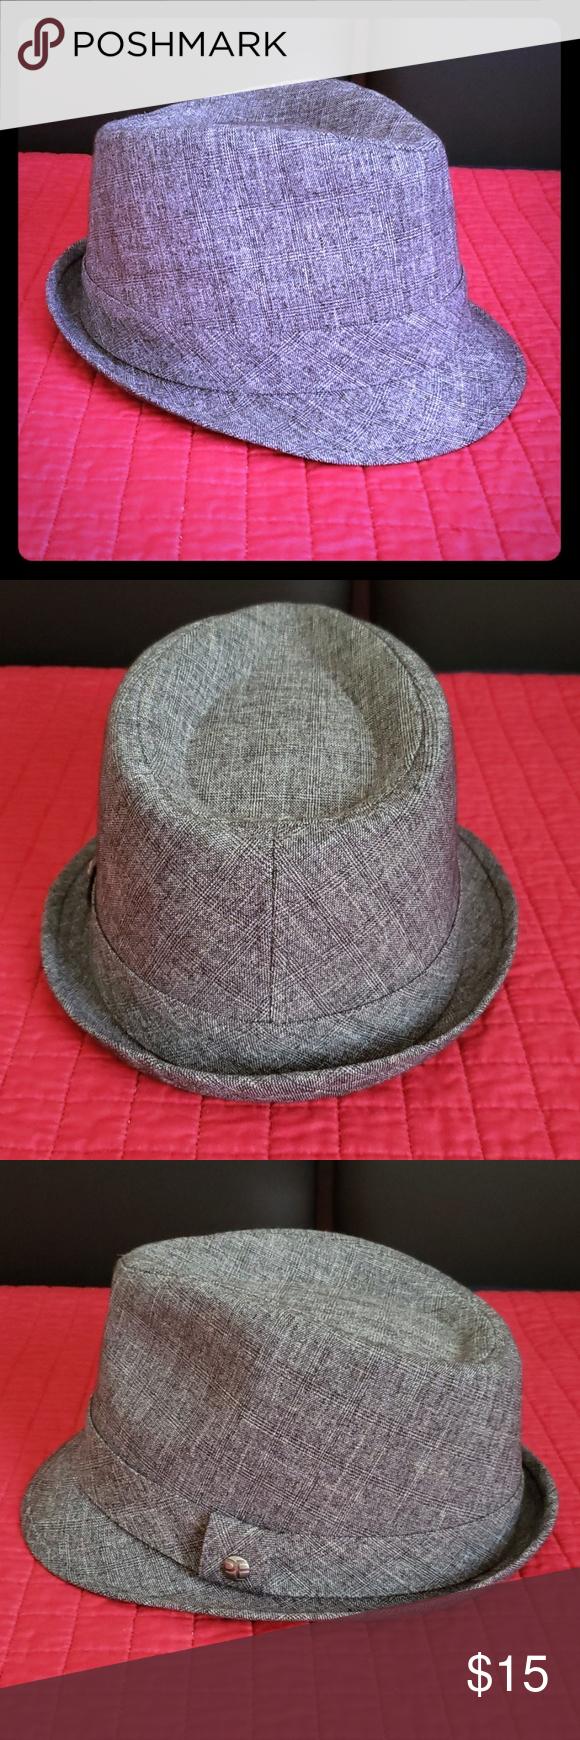 New Fedora Men S Hat Size L Xl Hats For Men Hat Sizes Mens Fedora